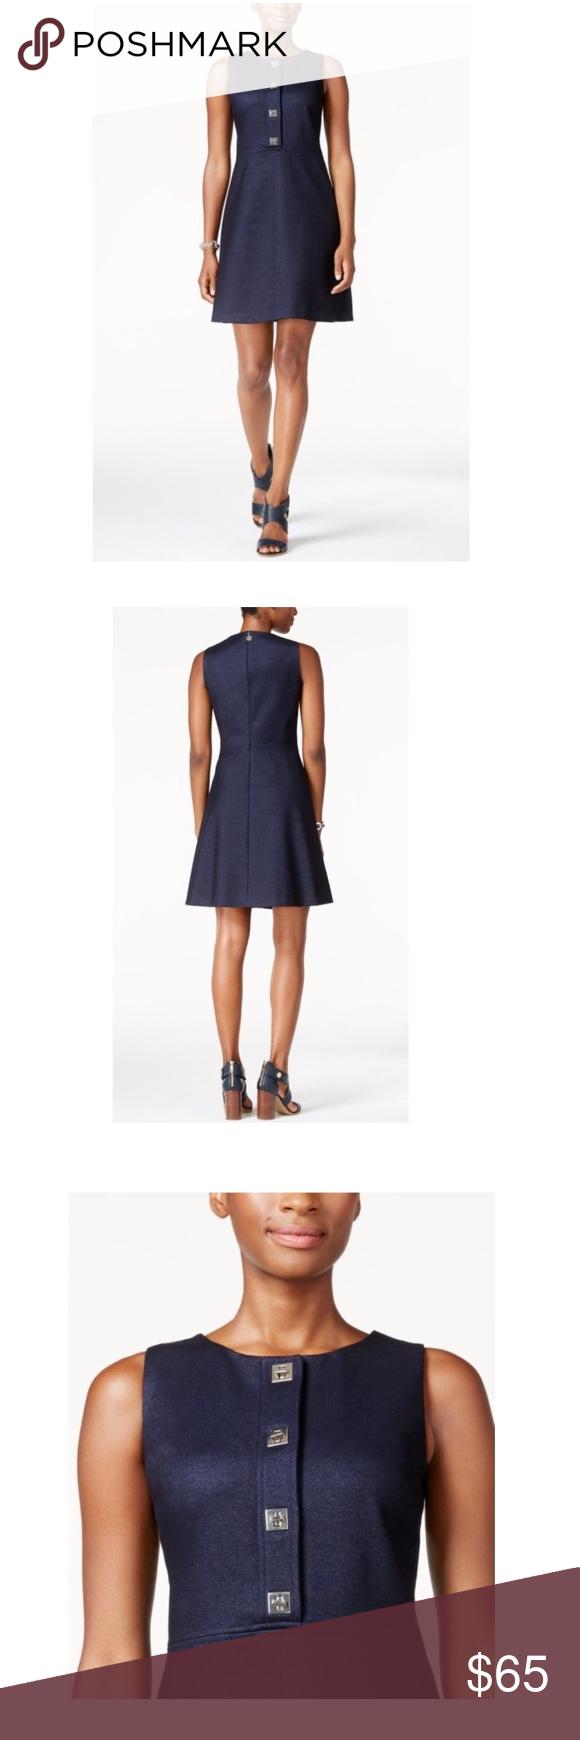 NWT Tommy Hilfiger Navy Turnlock Dress Sz. 14 Beautiful dress Tommy Hilfiger Dresses